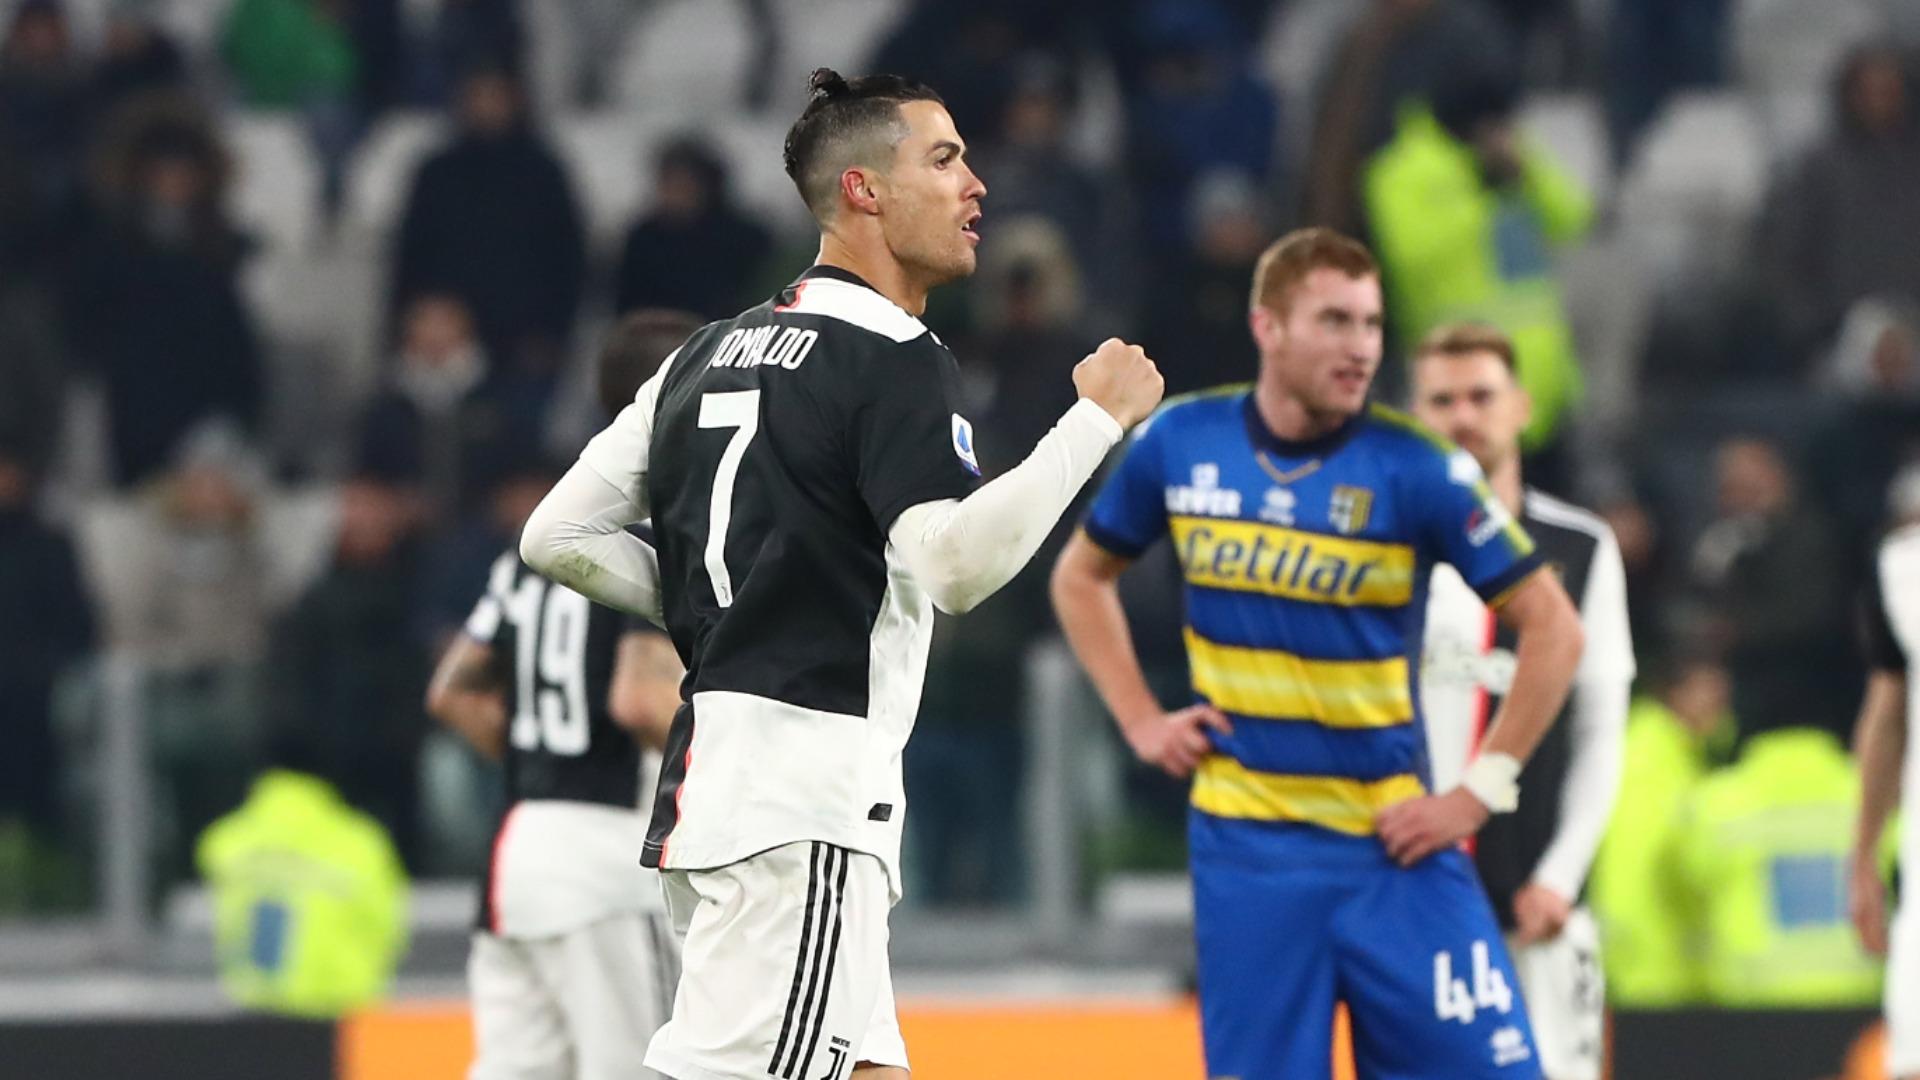 Juventus vs. Parma - Football Match Report